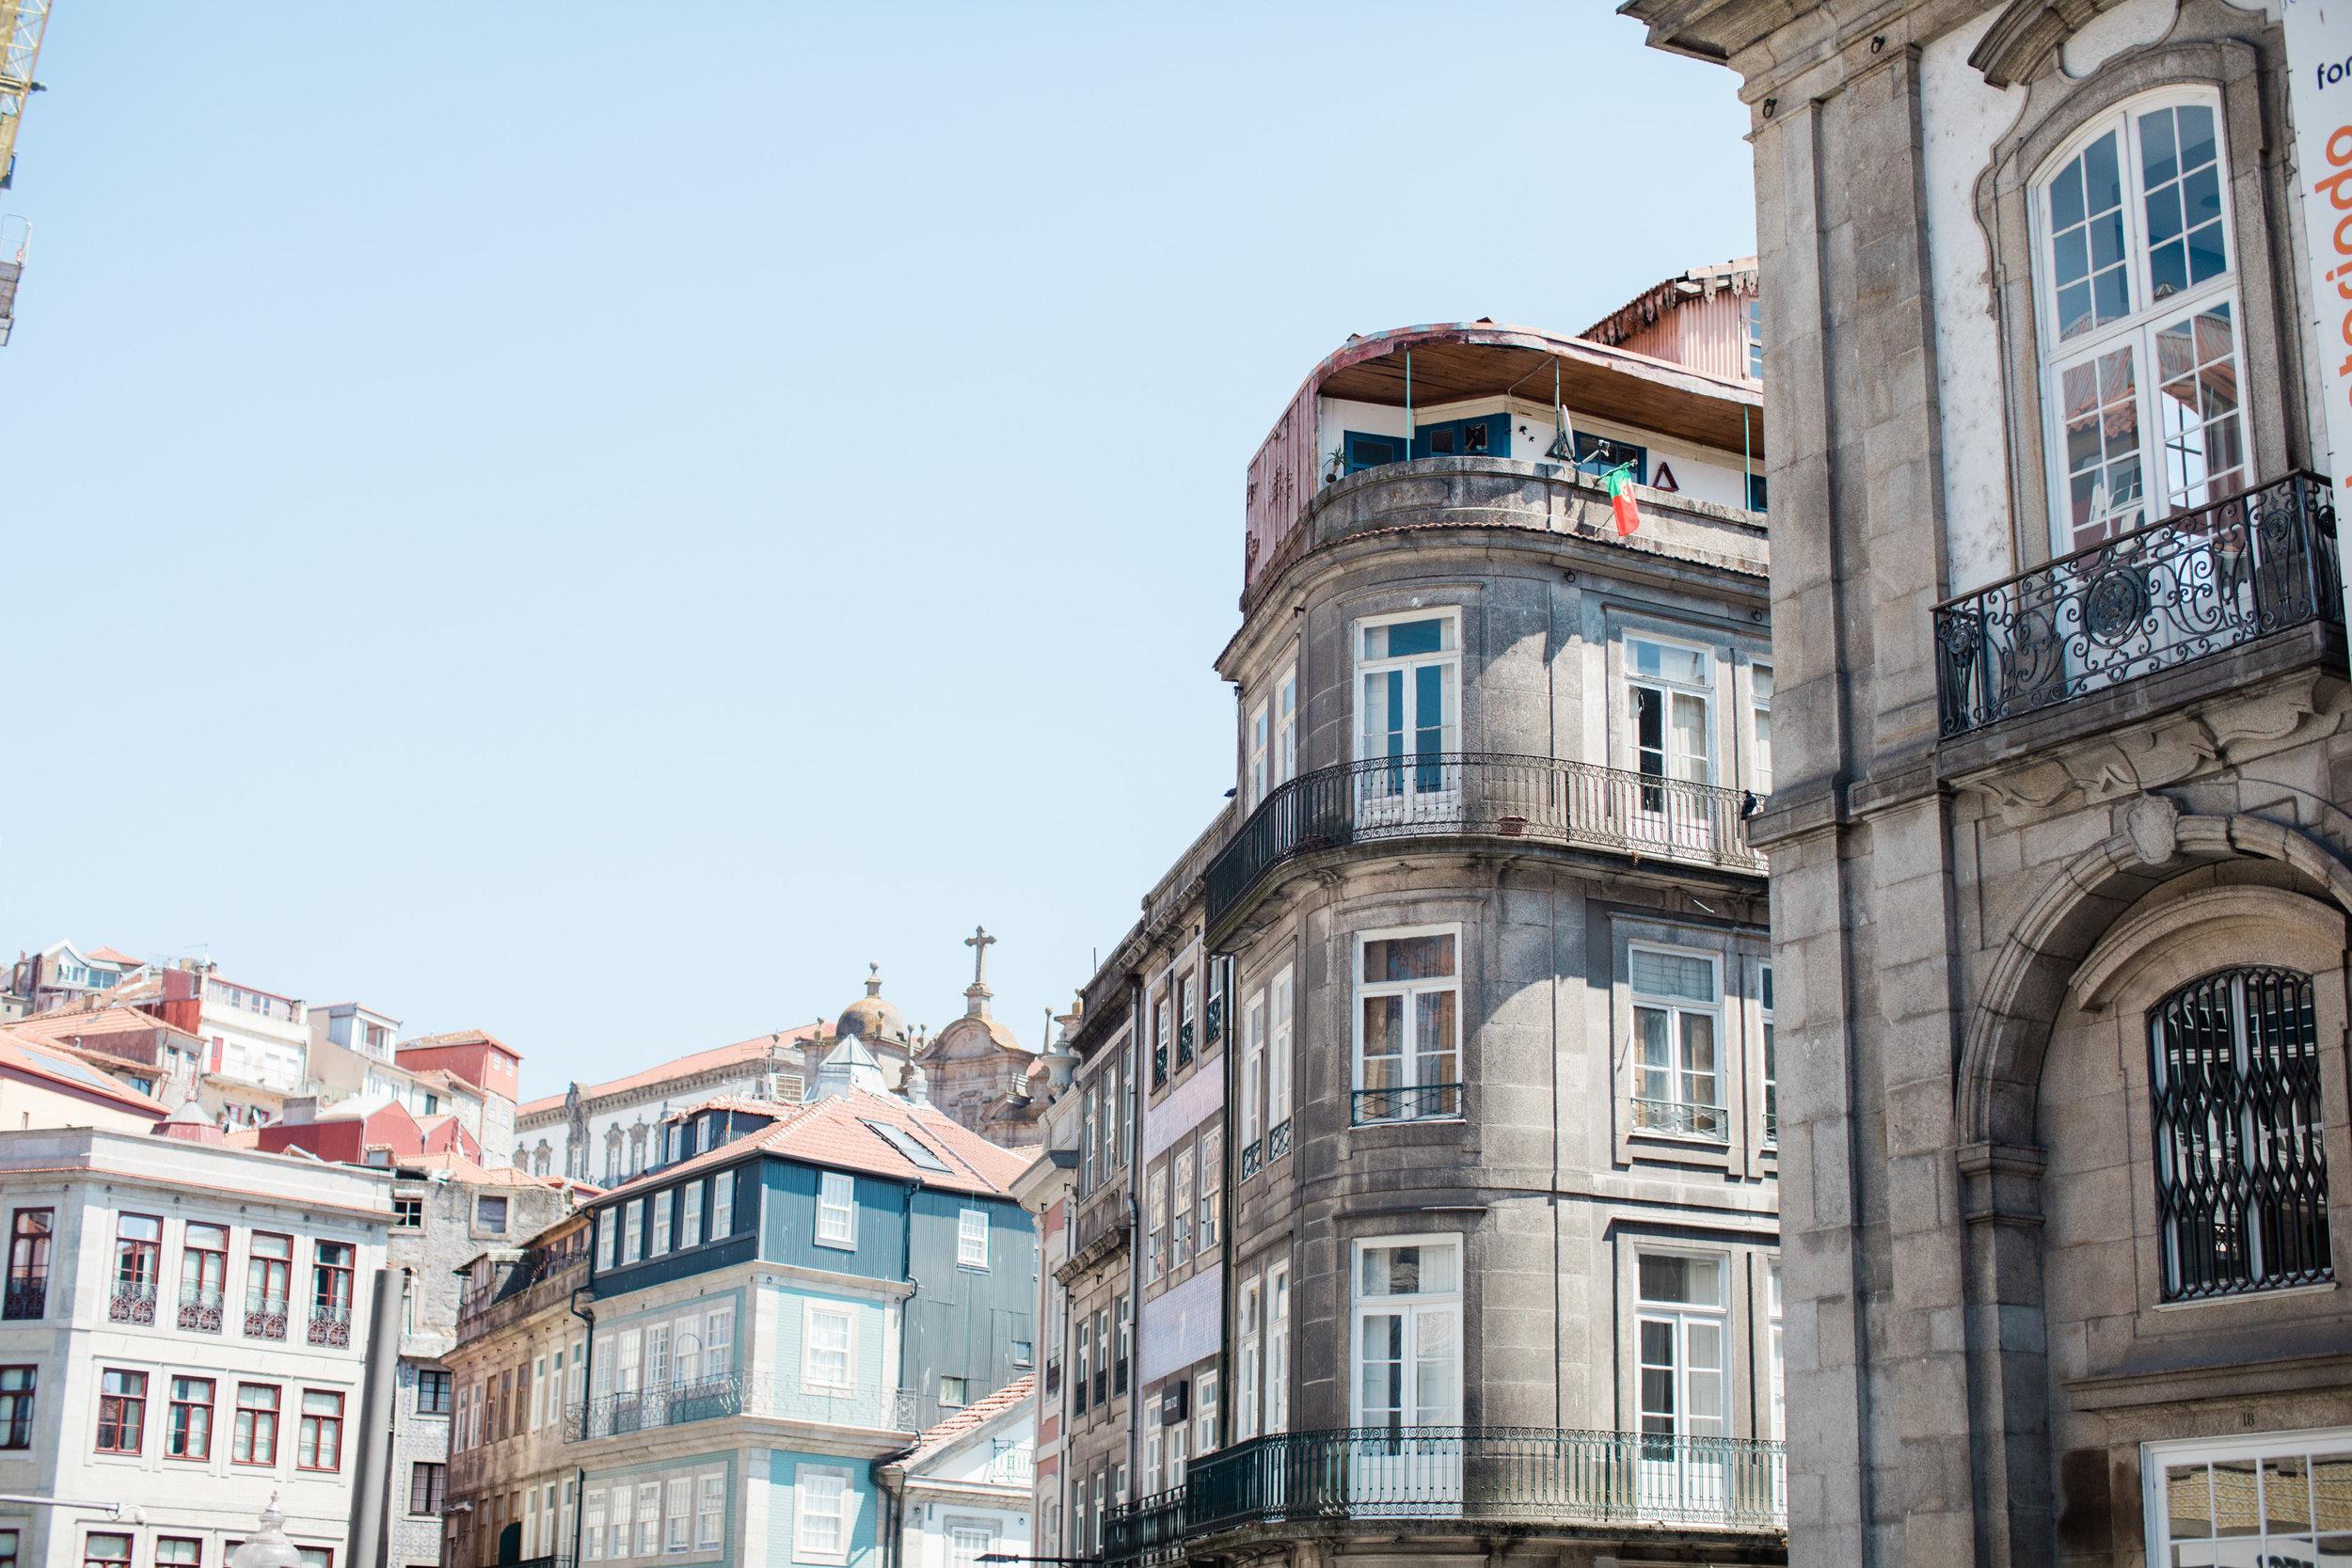 PortoPortugal_August2018-14.jpg